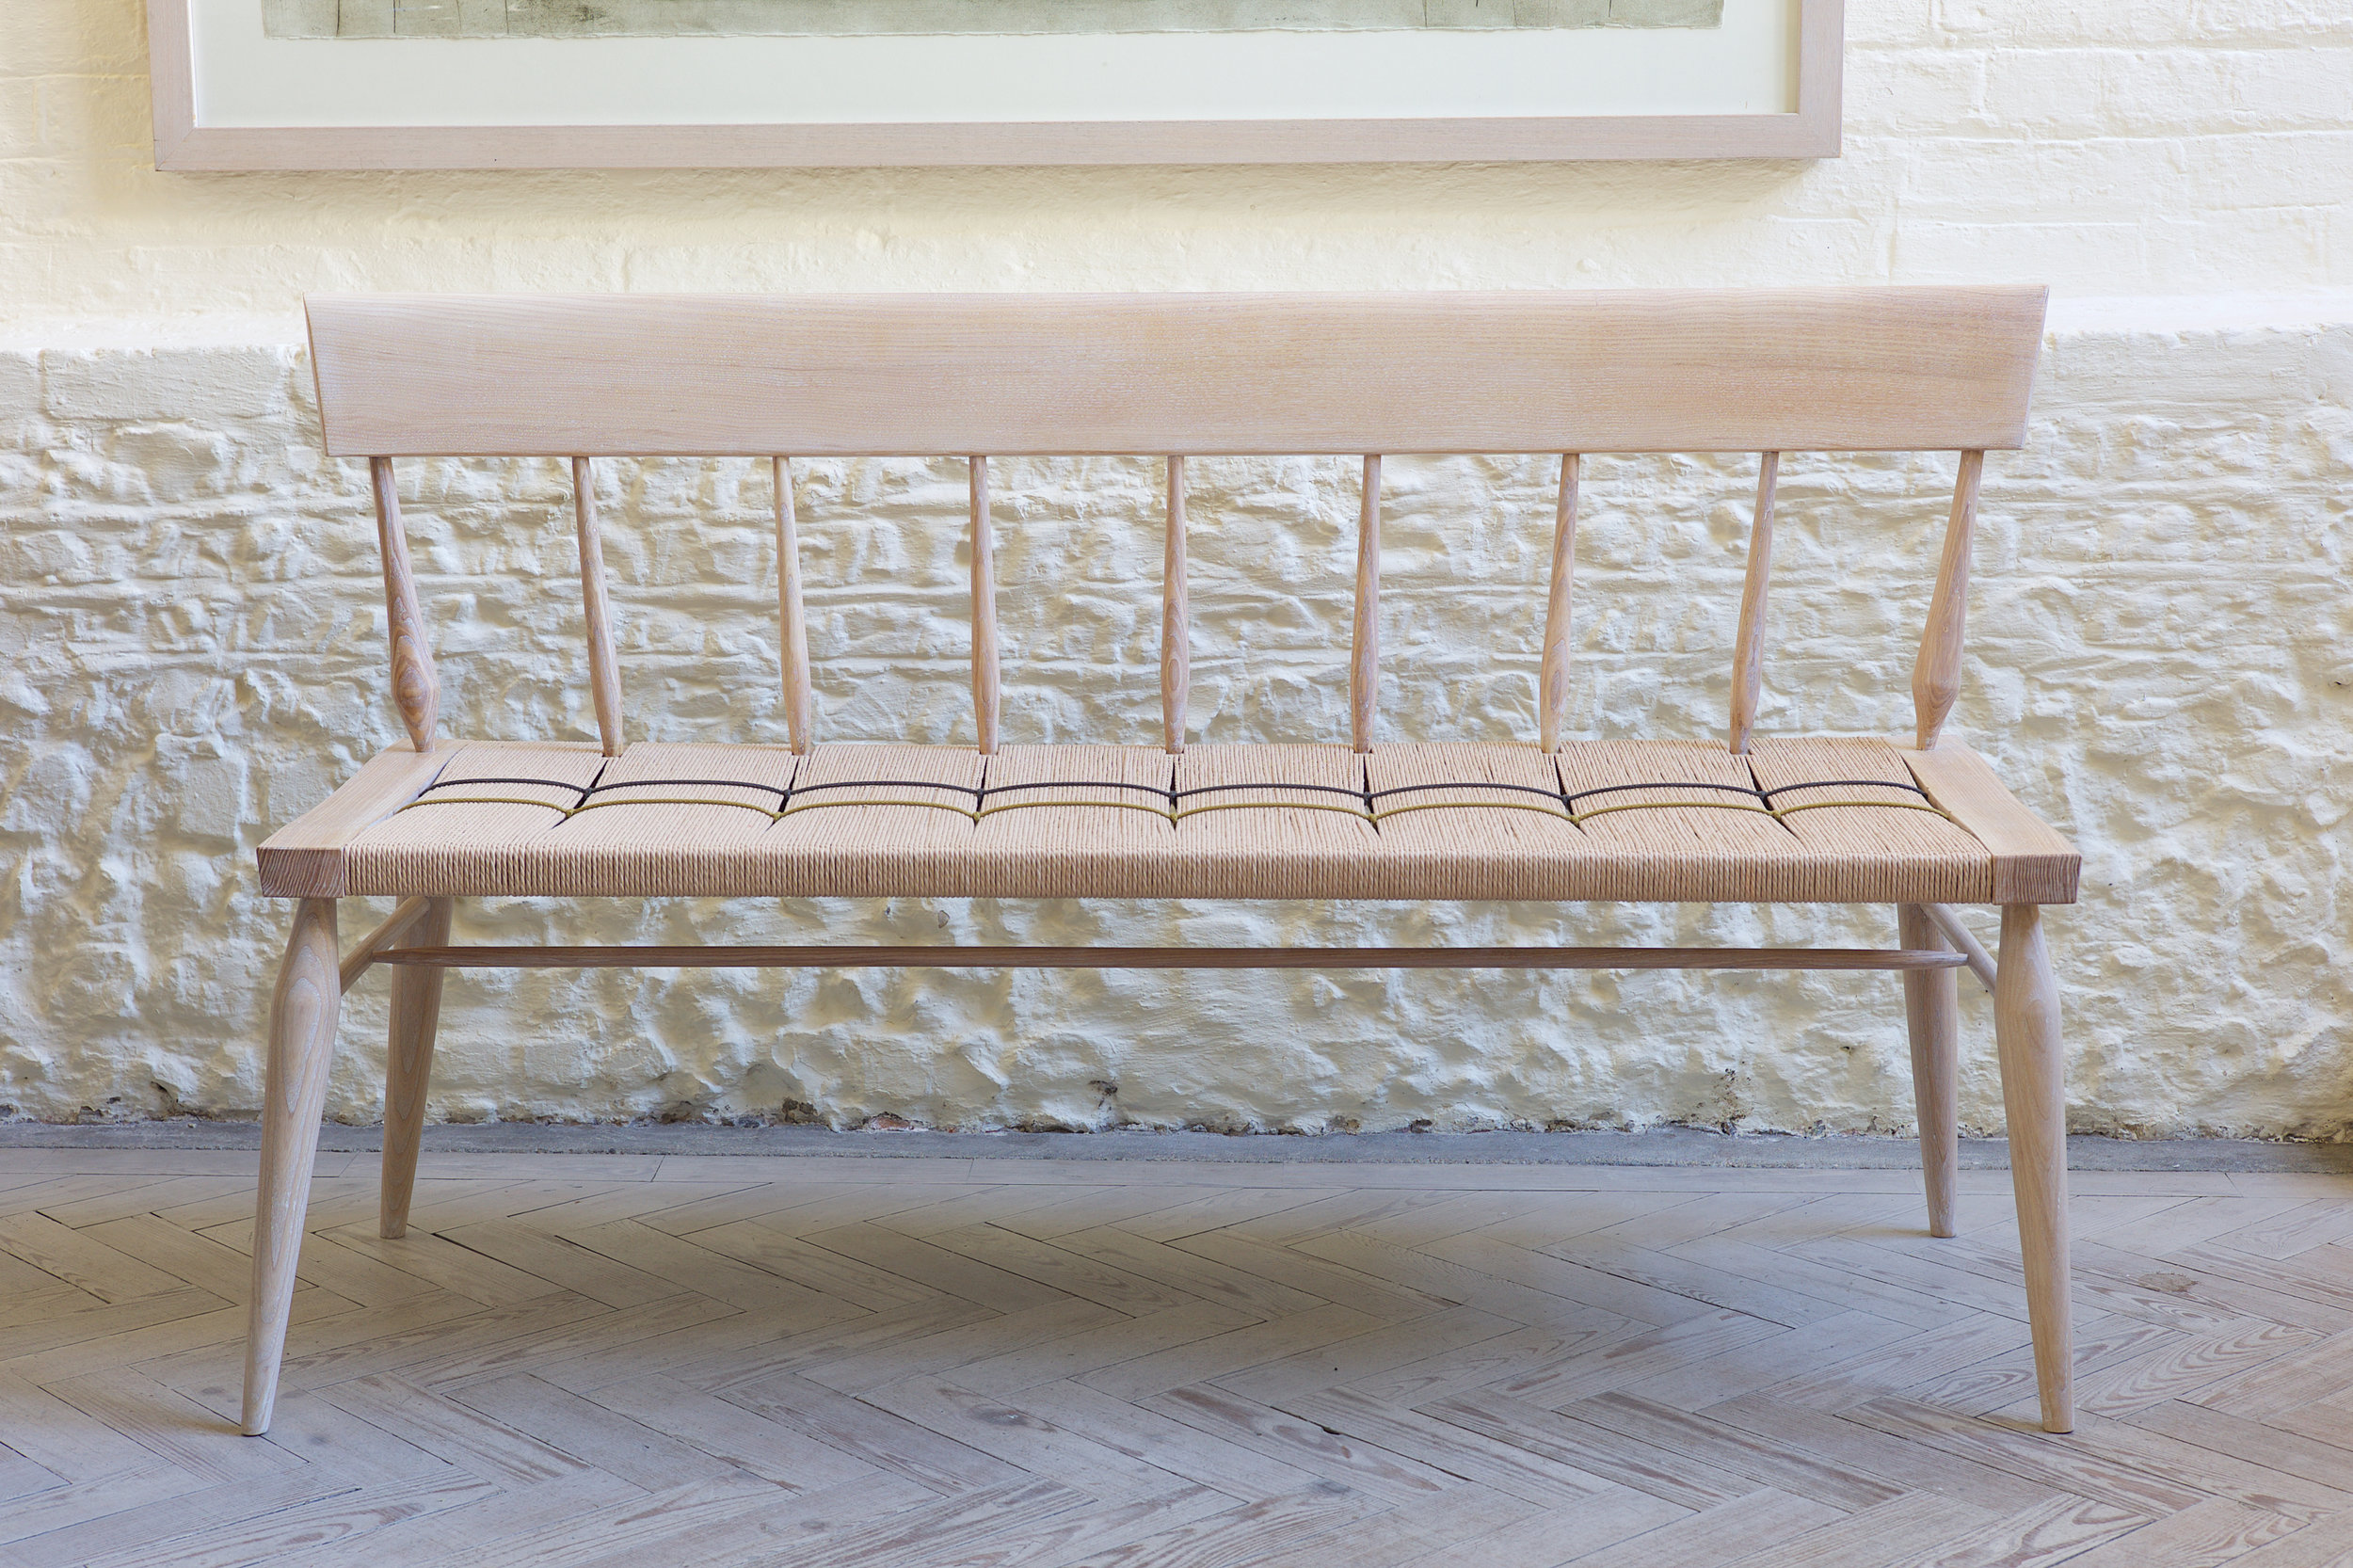 Petrel furniture woven bench